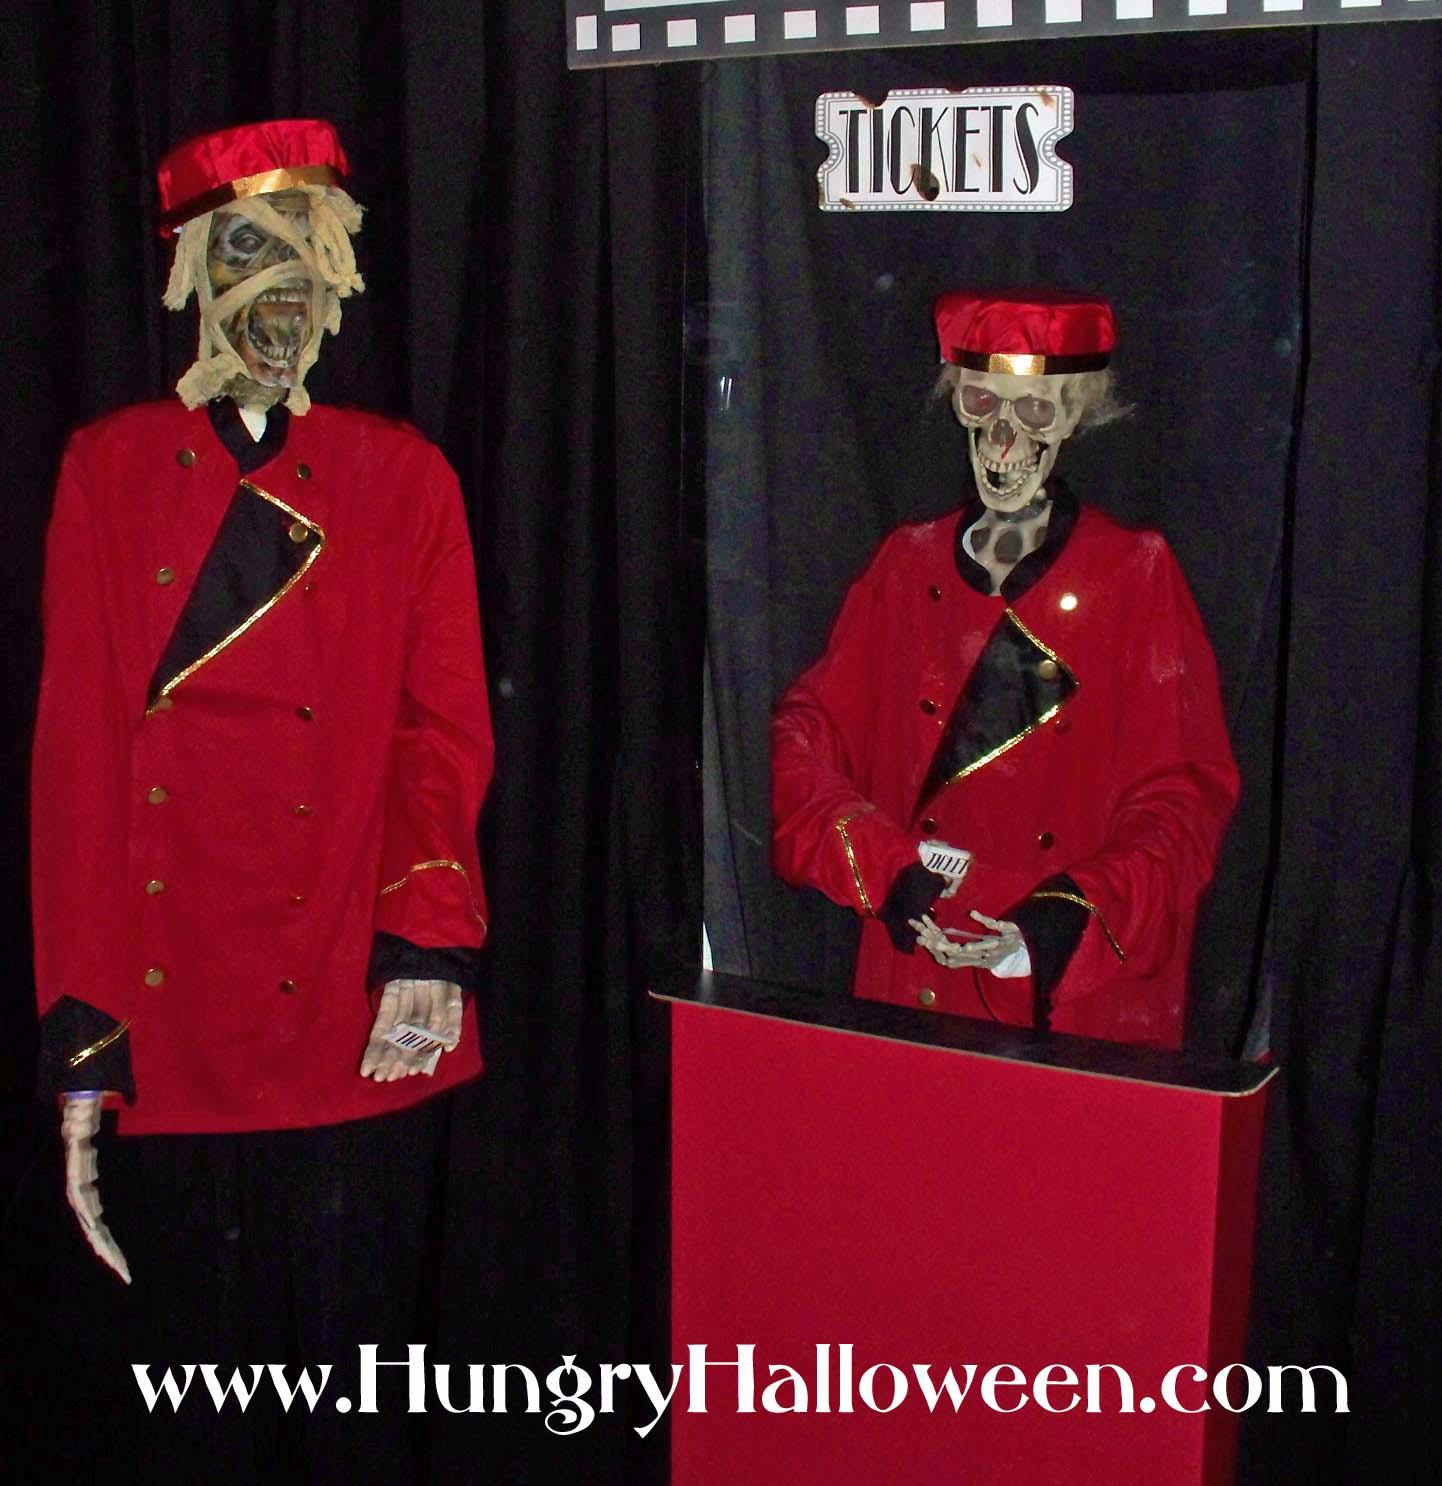 Halloween Decorations Catacomb Cinemas Including Zombie Ticket Takers